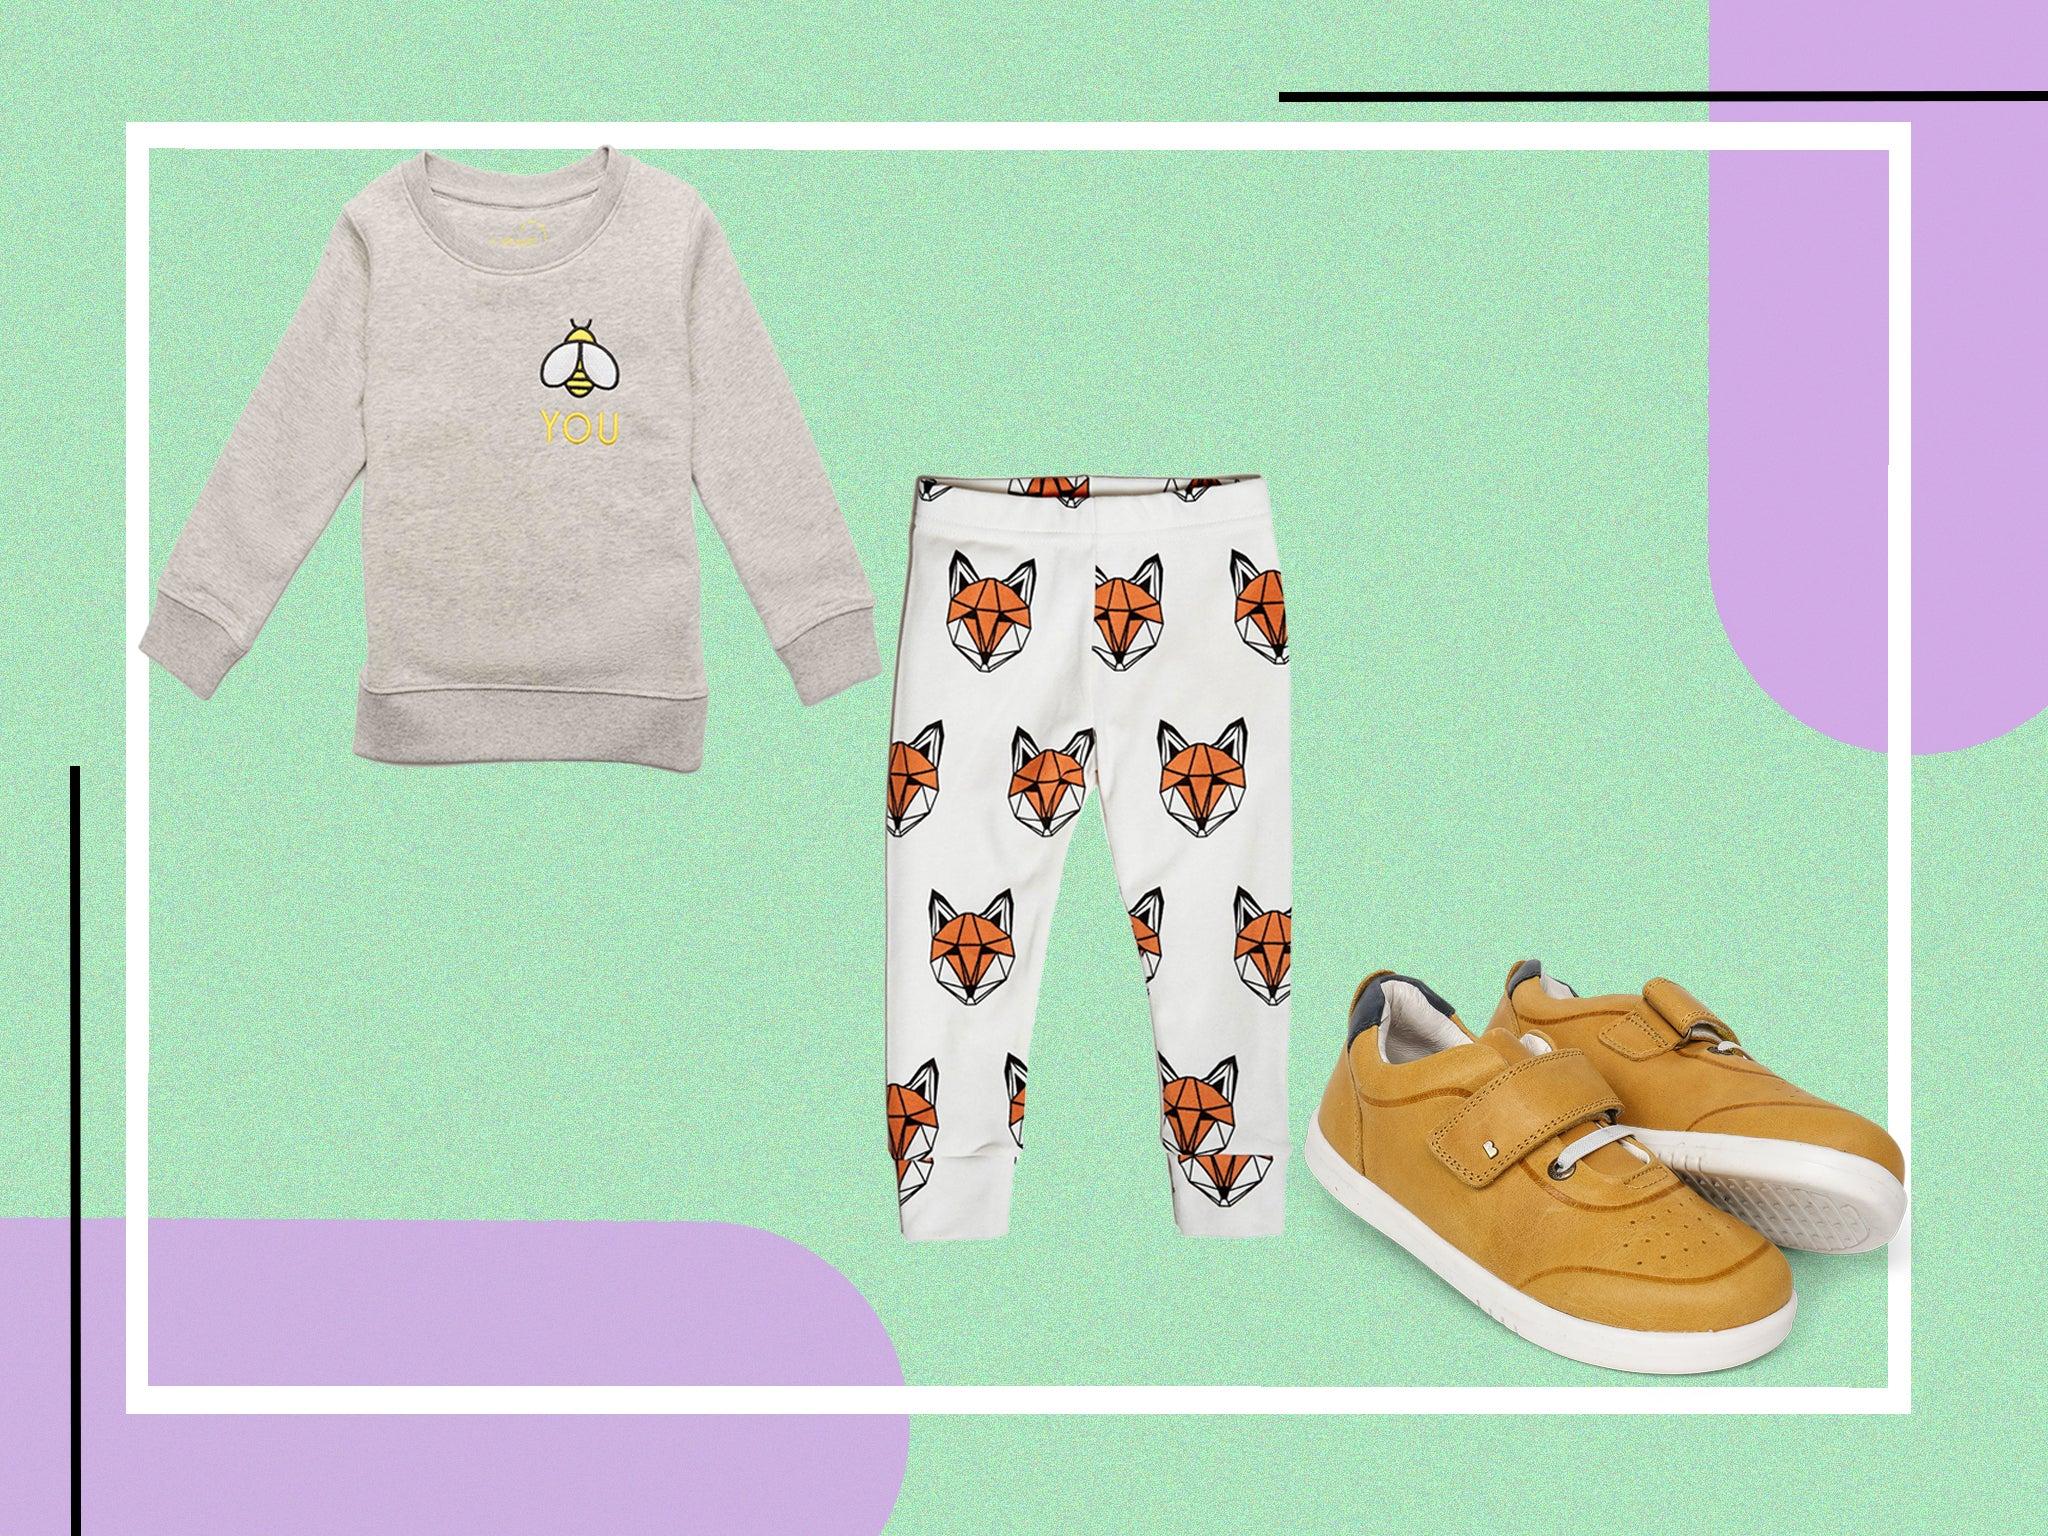 Exbrand Baby Romper Unisex Mini Club Rainbow Striped Babygrow Sleepsuit Newborn 18mths